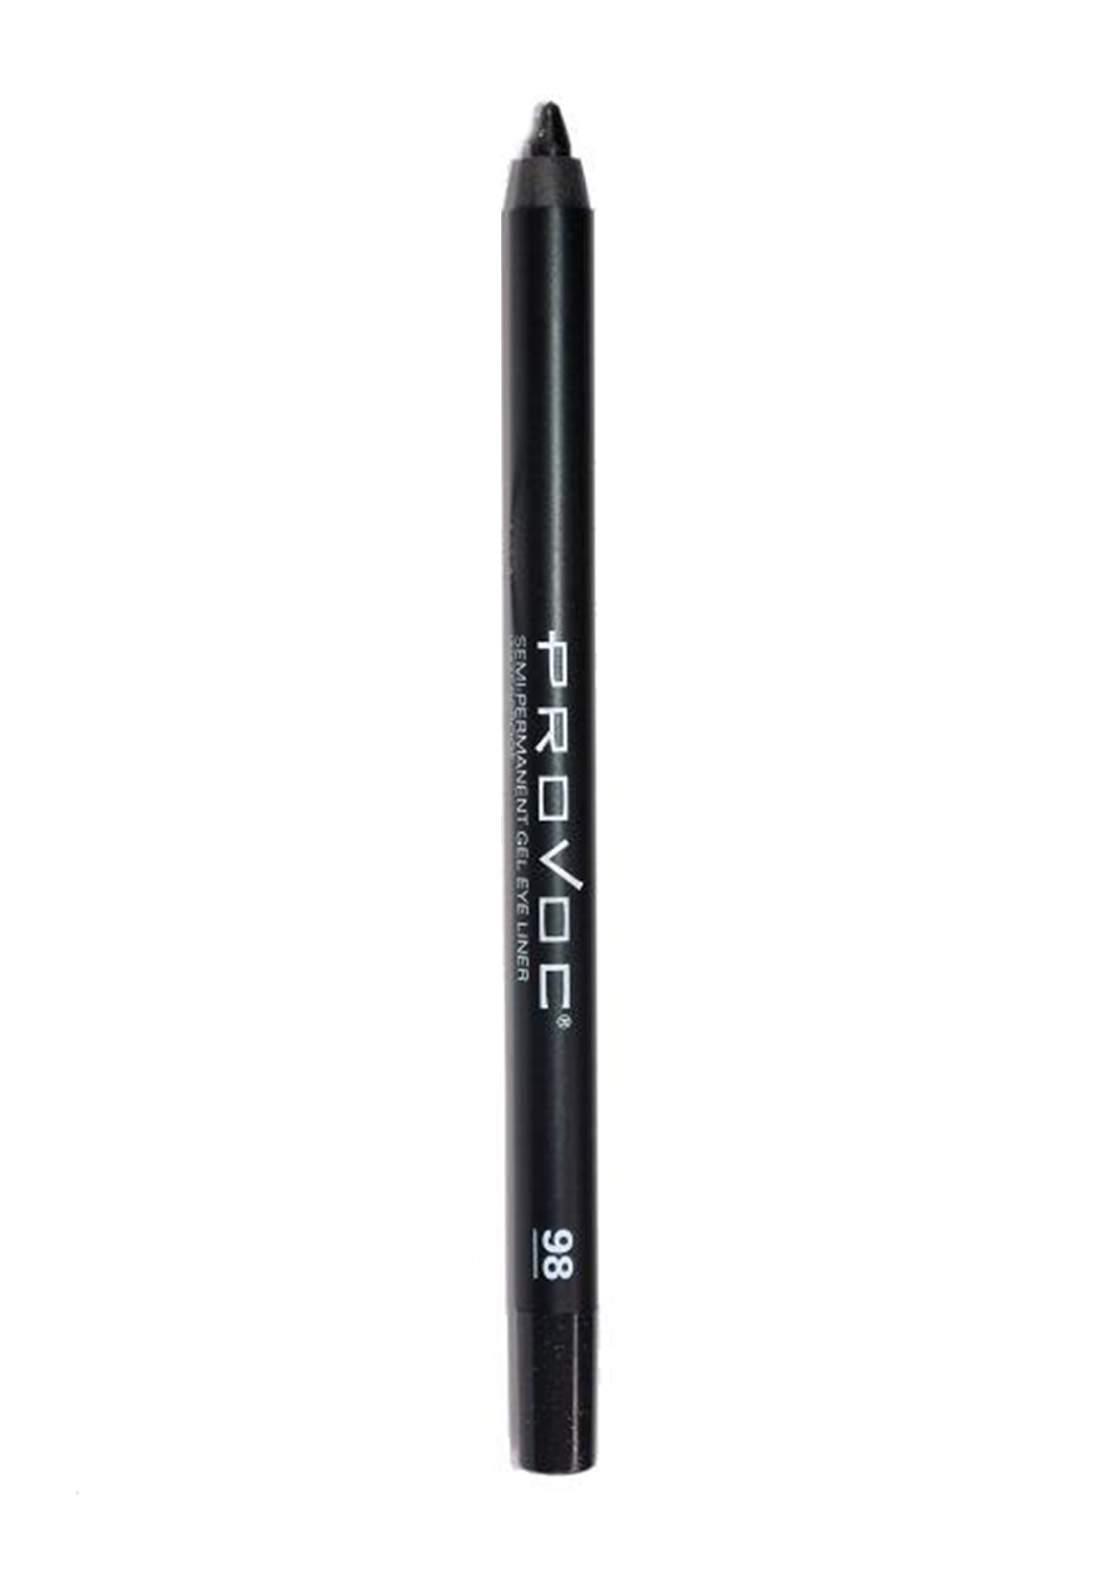 Provoc 353-0081 Semi-Permanent Gel Waterproof Eyeliner No.98 Mischevious قلم محدد العيون